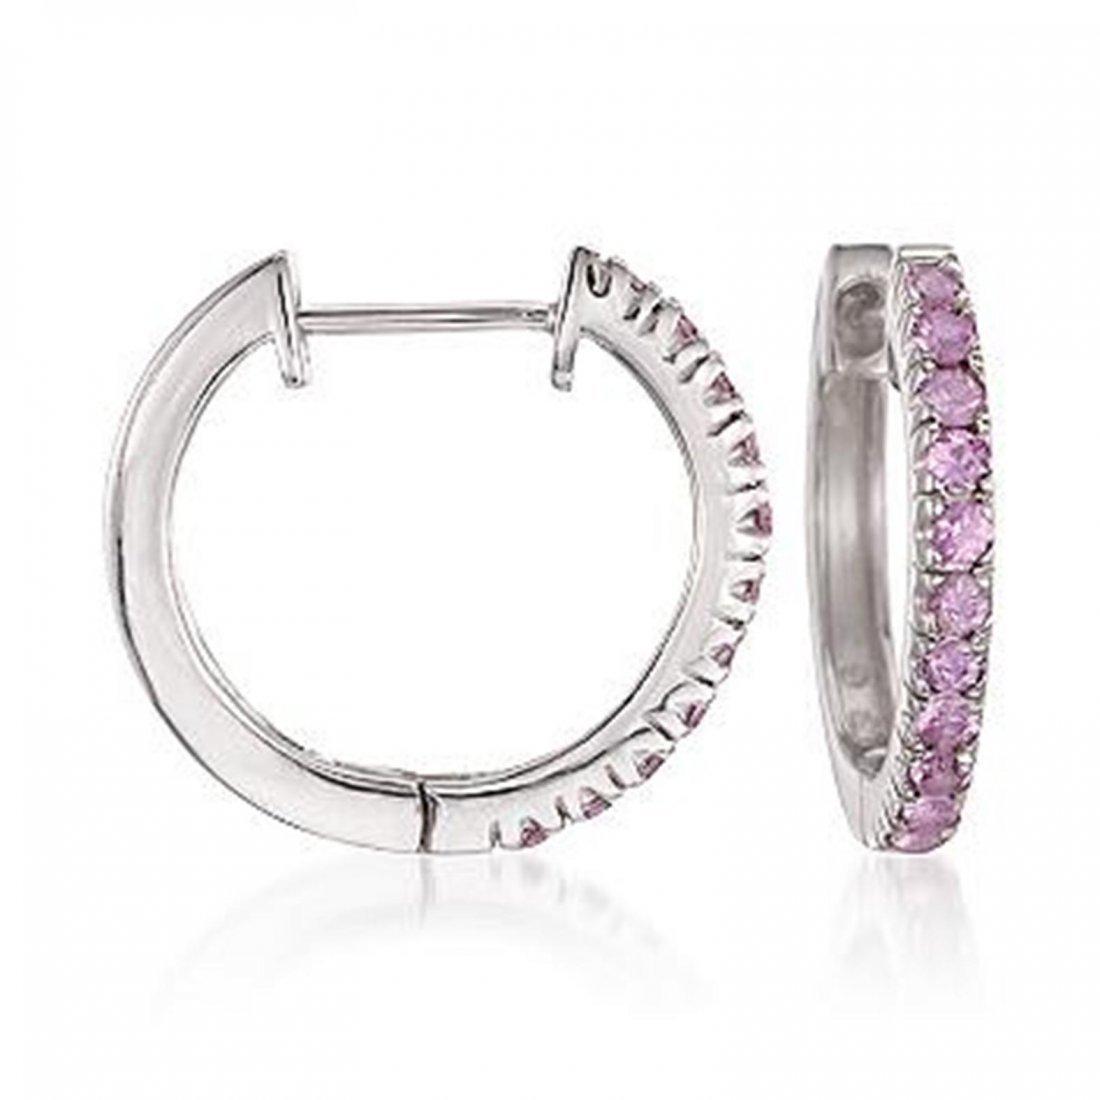 1.10 ct. t.w. Pink Sapphire Hoop Earrings in Sterling S